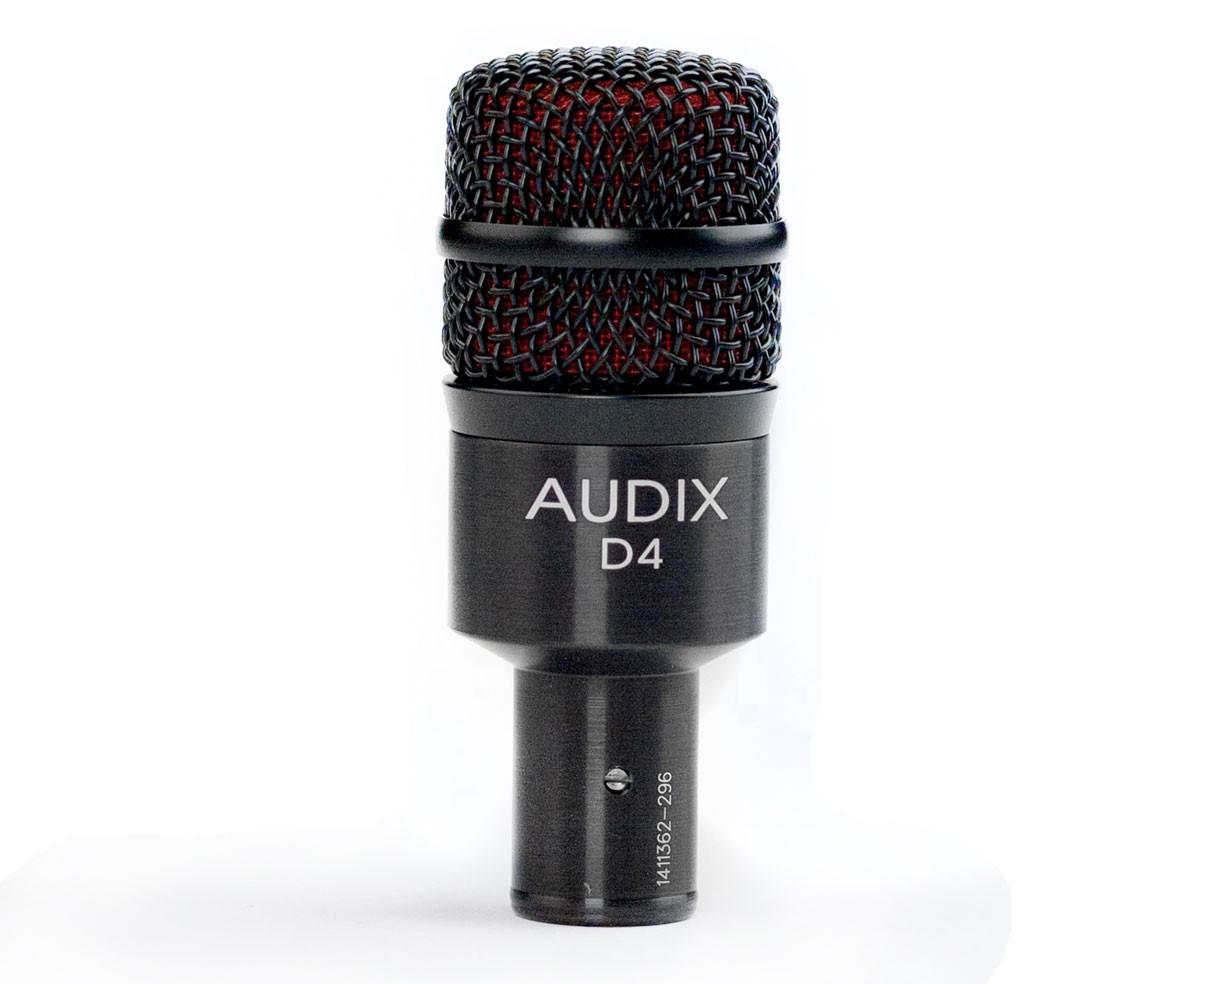 Audix D4 Hypercardioid